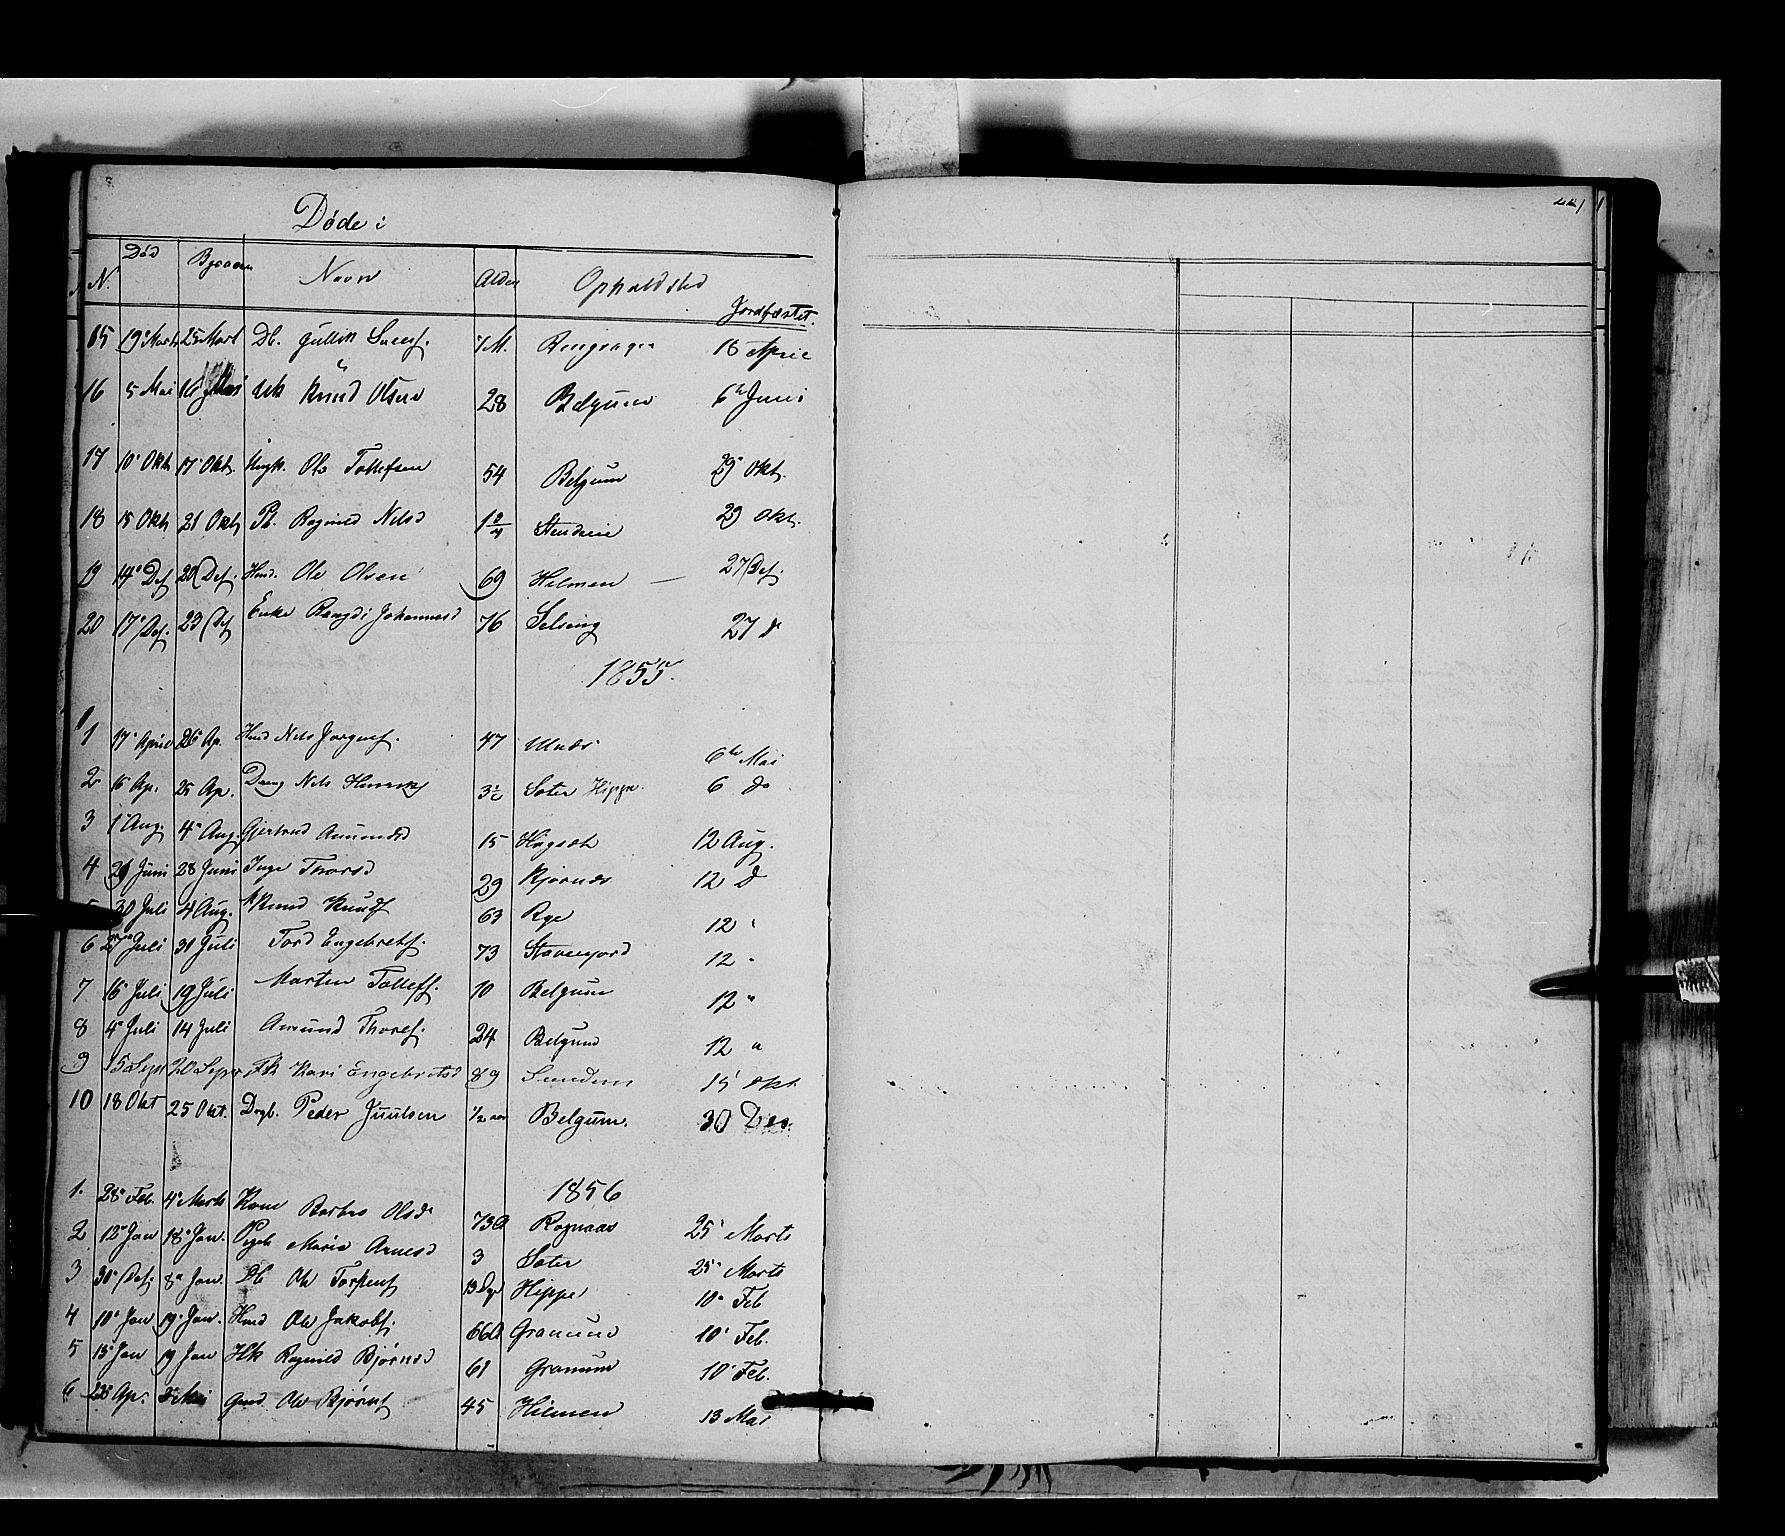 SAH, Nord-Aurdal prestekontor, Ministerialbok nr. 6, 1842-1863, s. 227